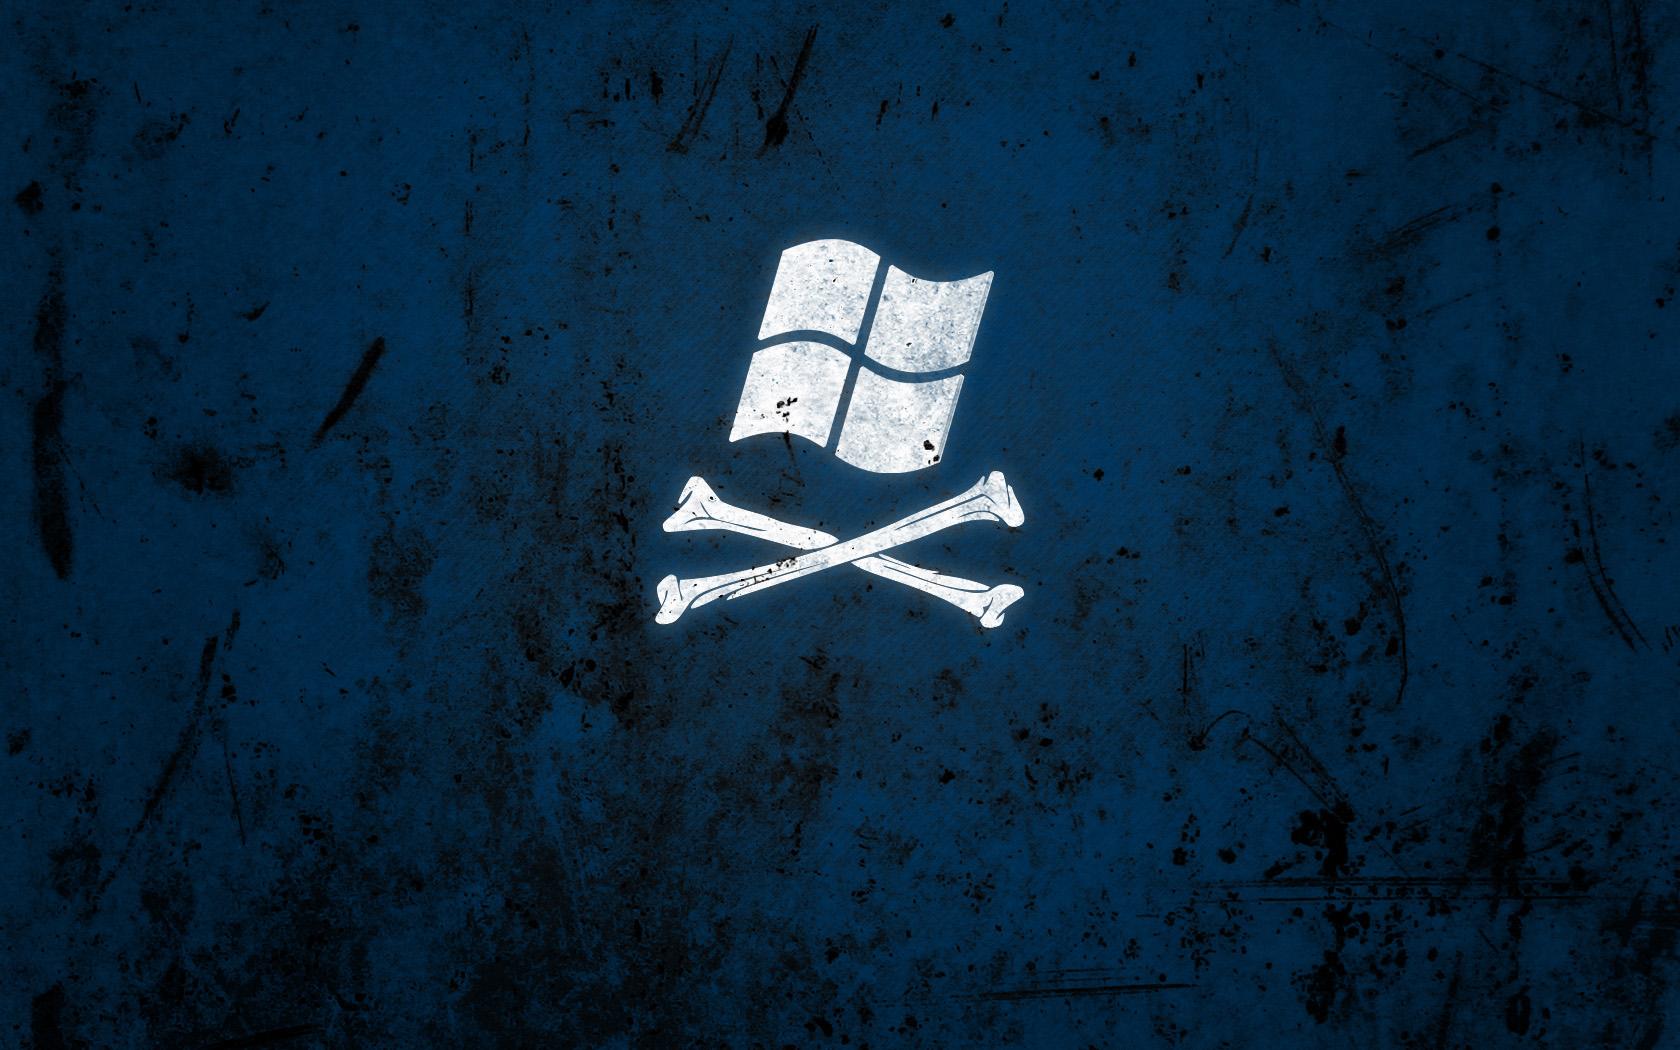 HD wallpaper : Windows Pirate Blue Desktop Wallpapers Wallpaper by ...